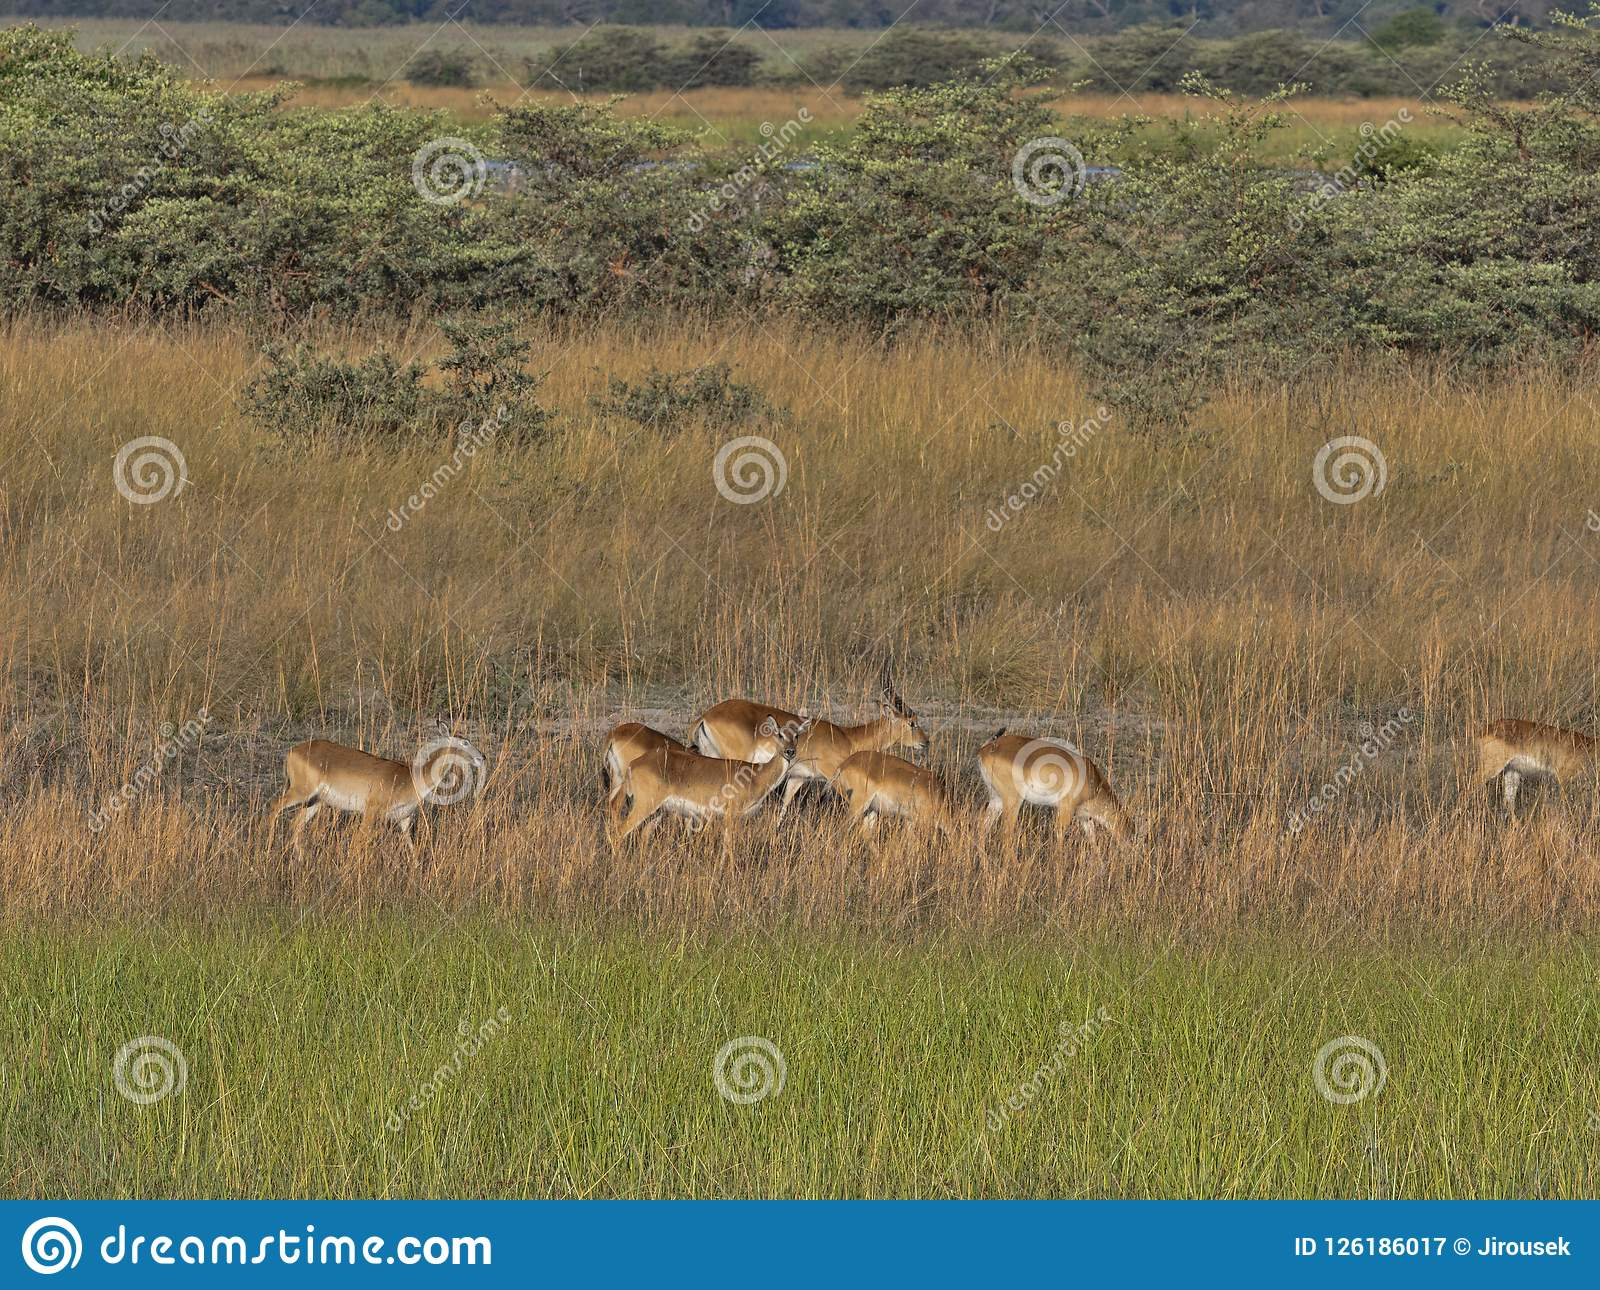 Herd Southern lechwe, Kobus leche, in tall grass, at Lake Horseshoe in Bwabwata, Namibia